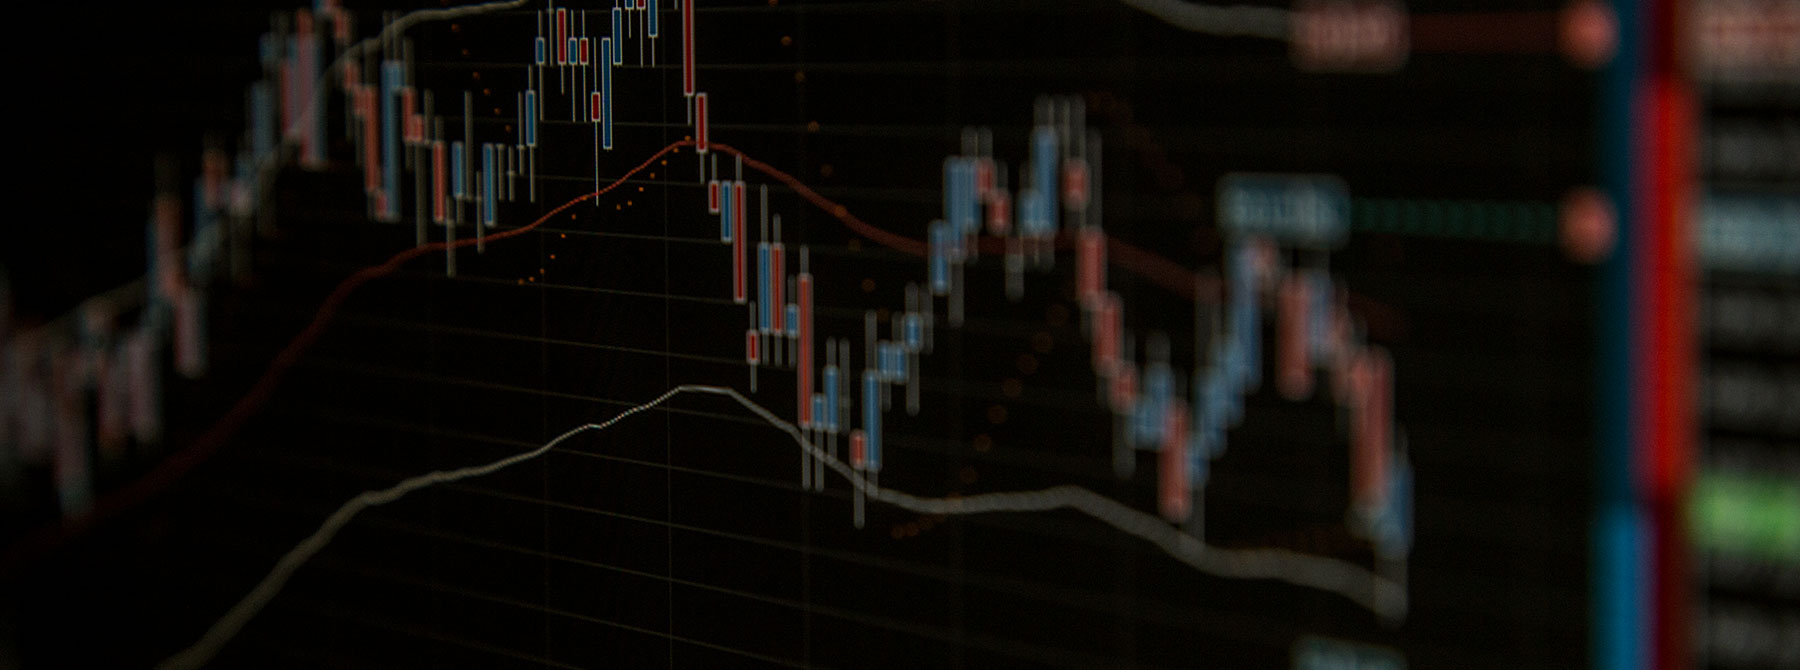 Charting & Analytics Software   Trading Technologies